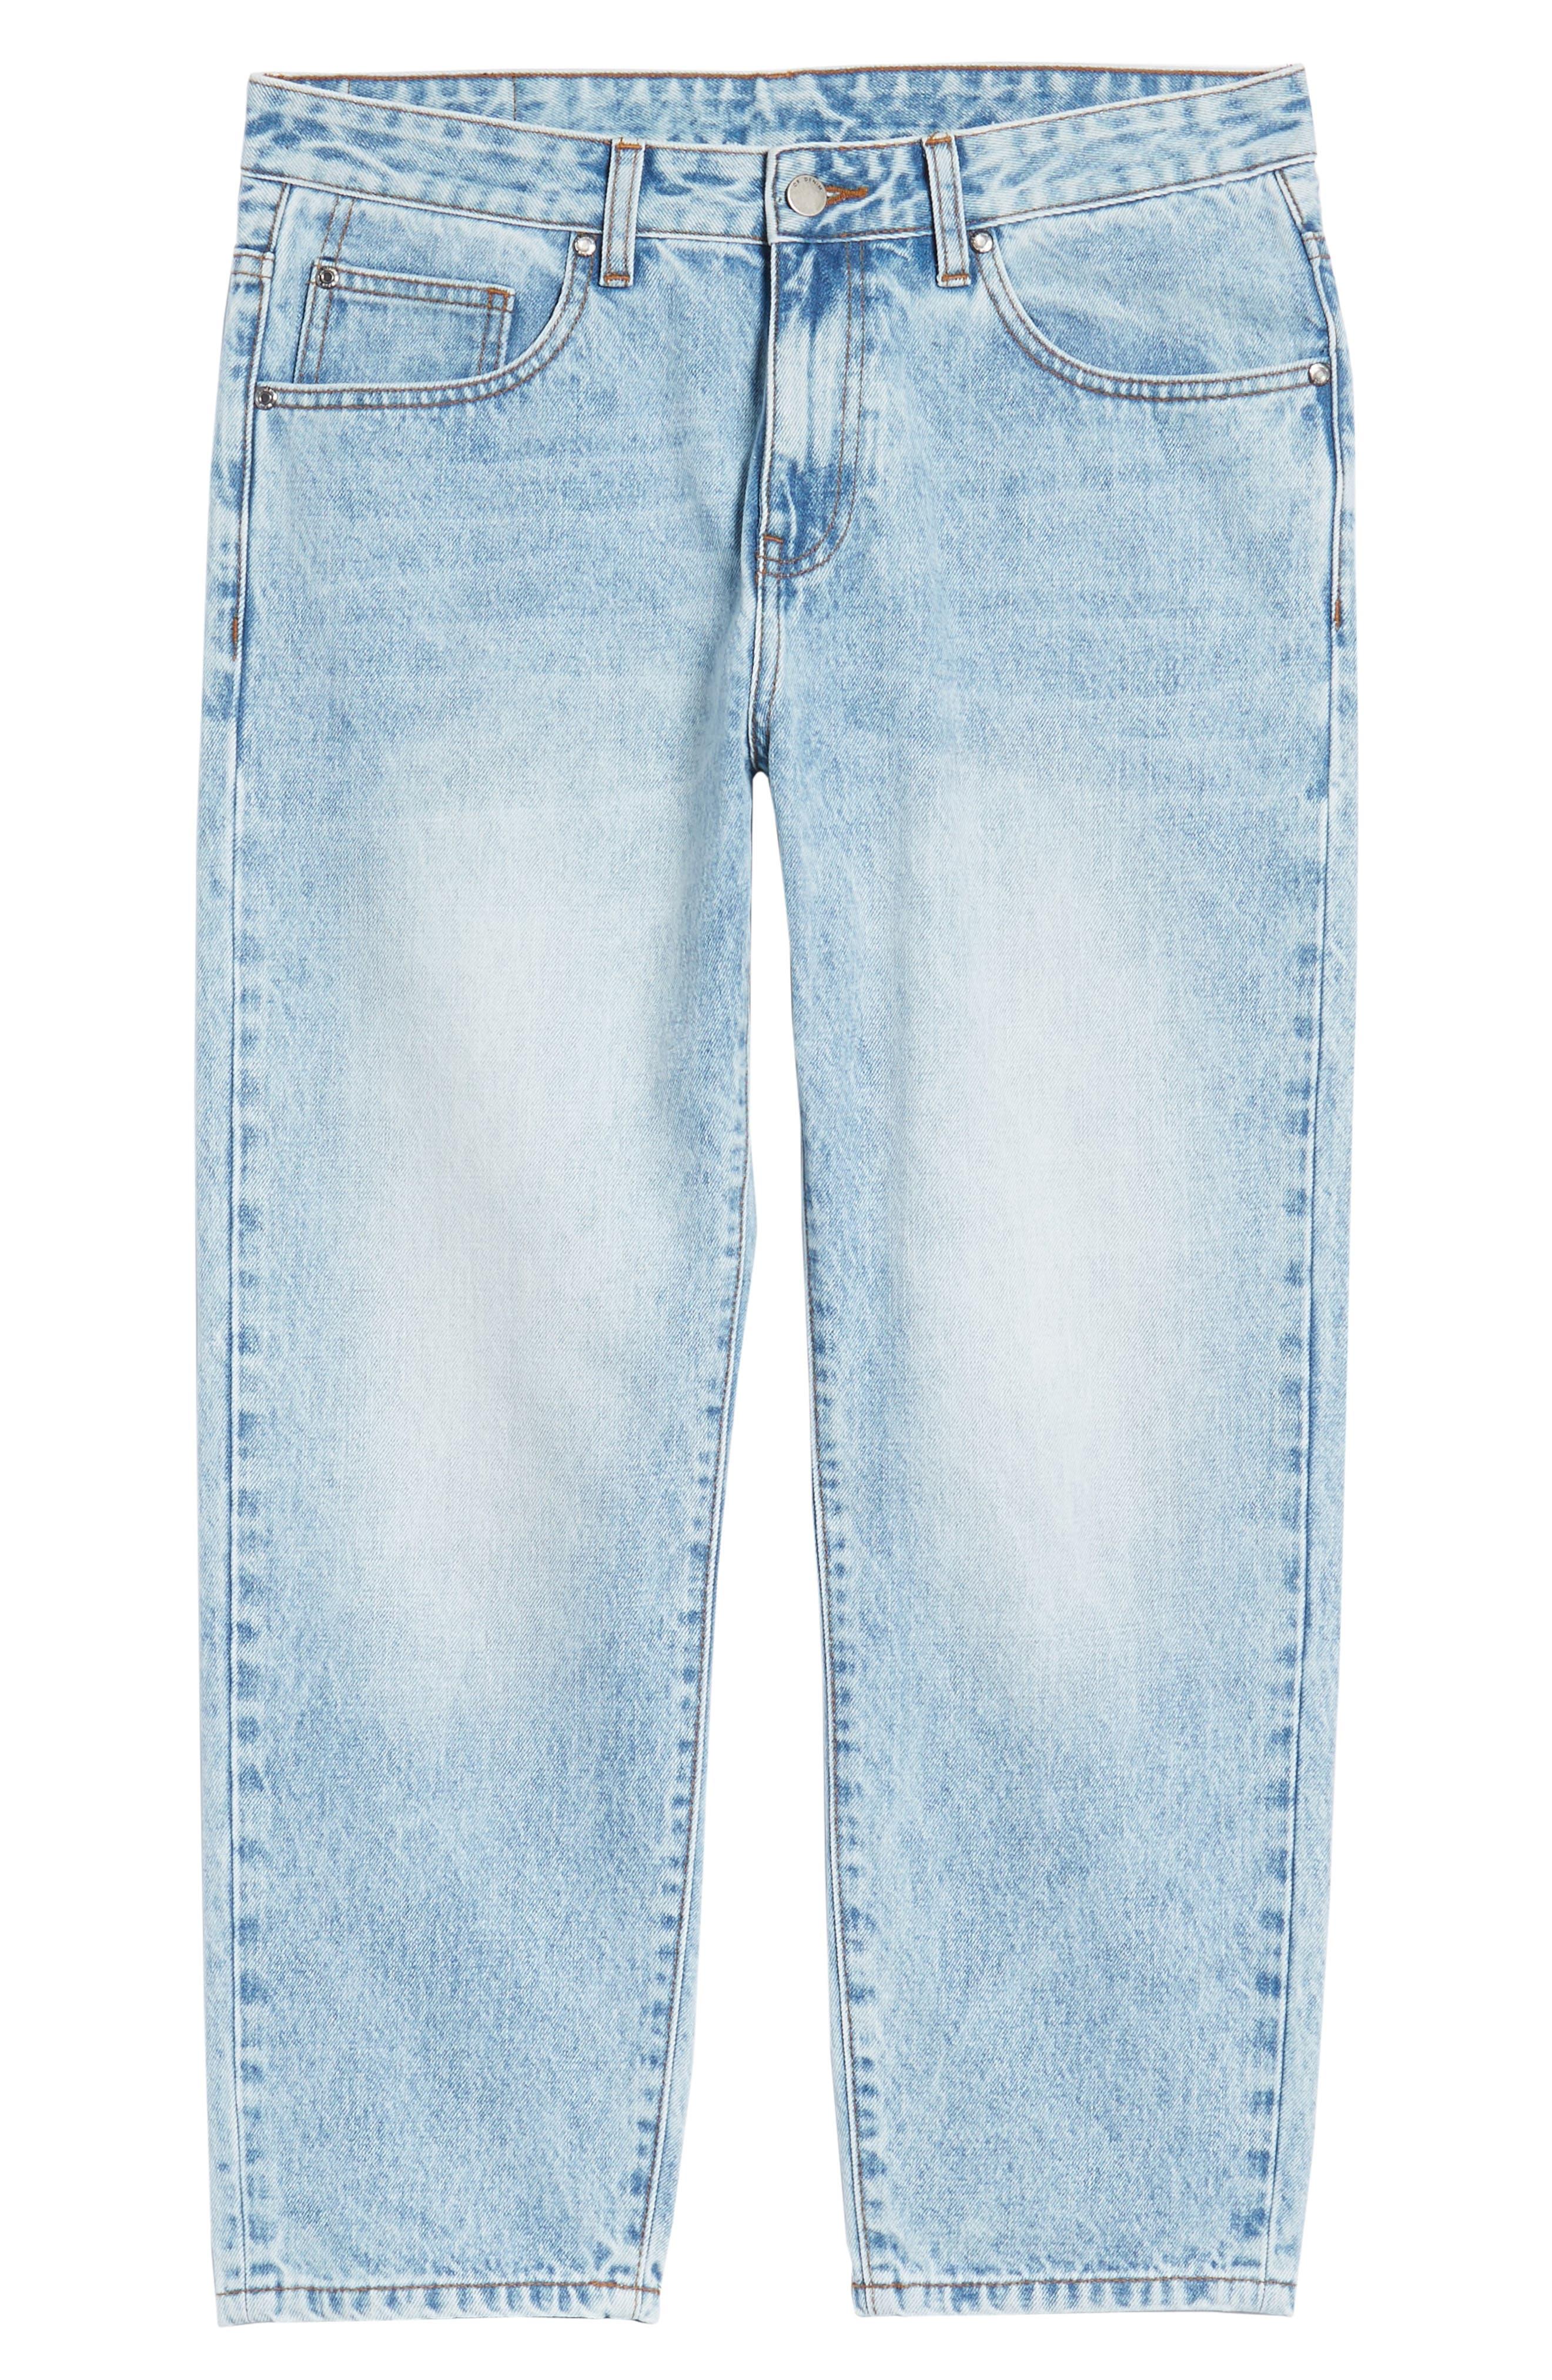 Otis Straight Leg Jeans,                             Alternate thumbnail 6, color,                             Light Blue Wash